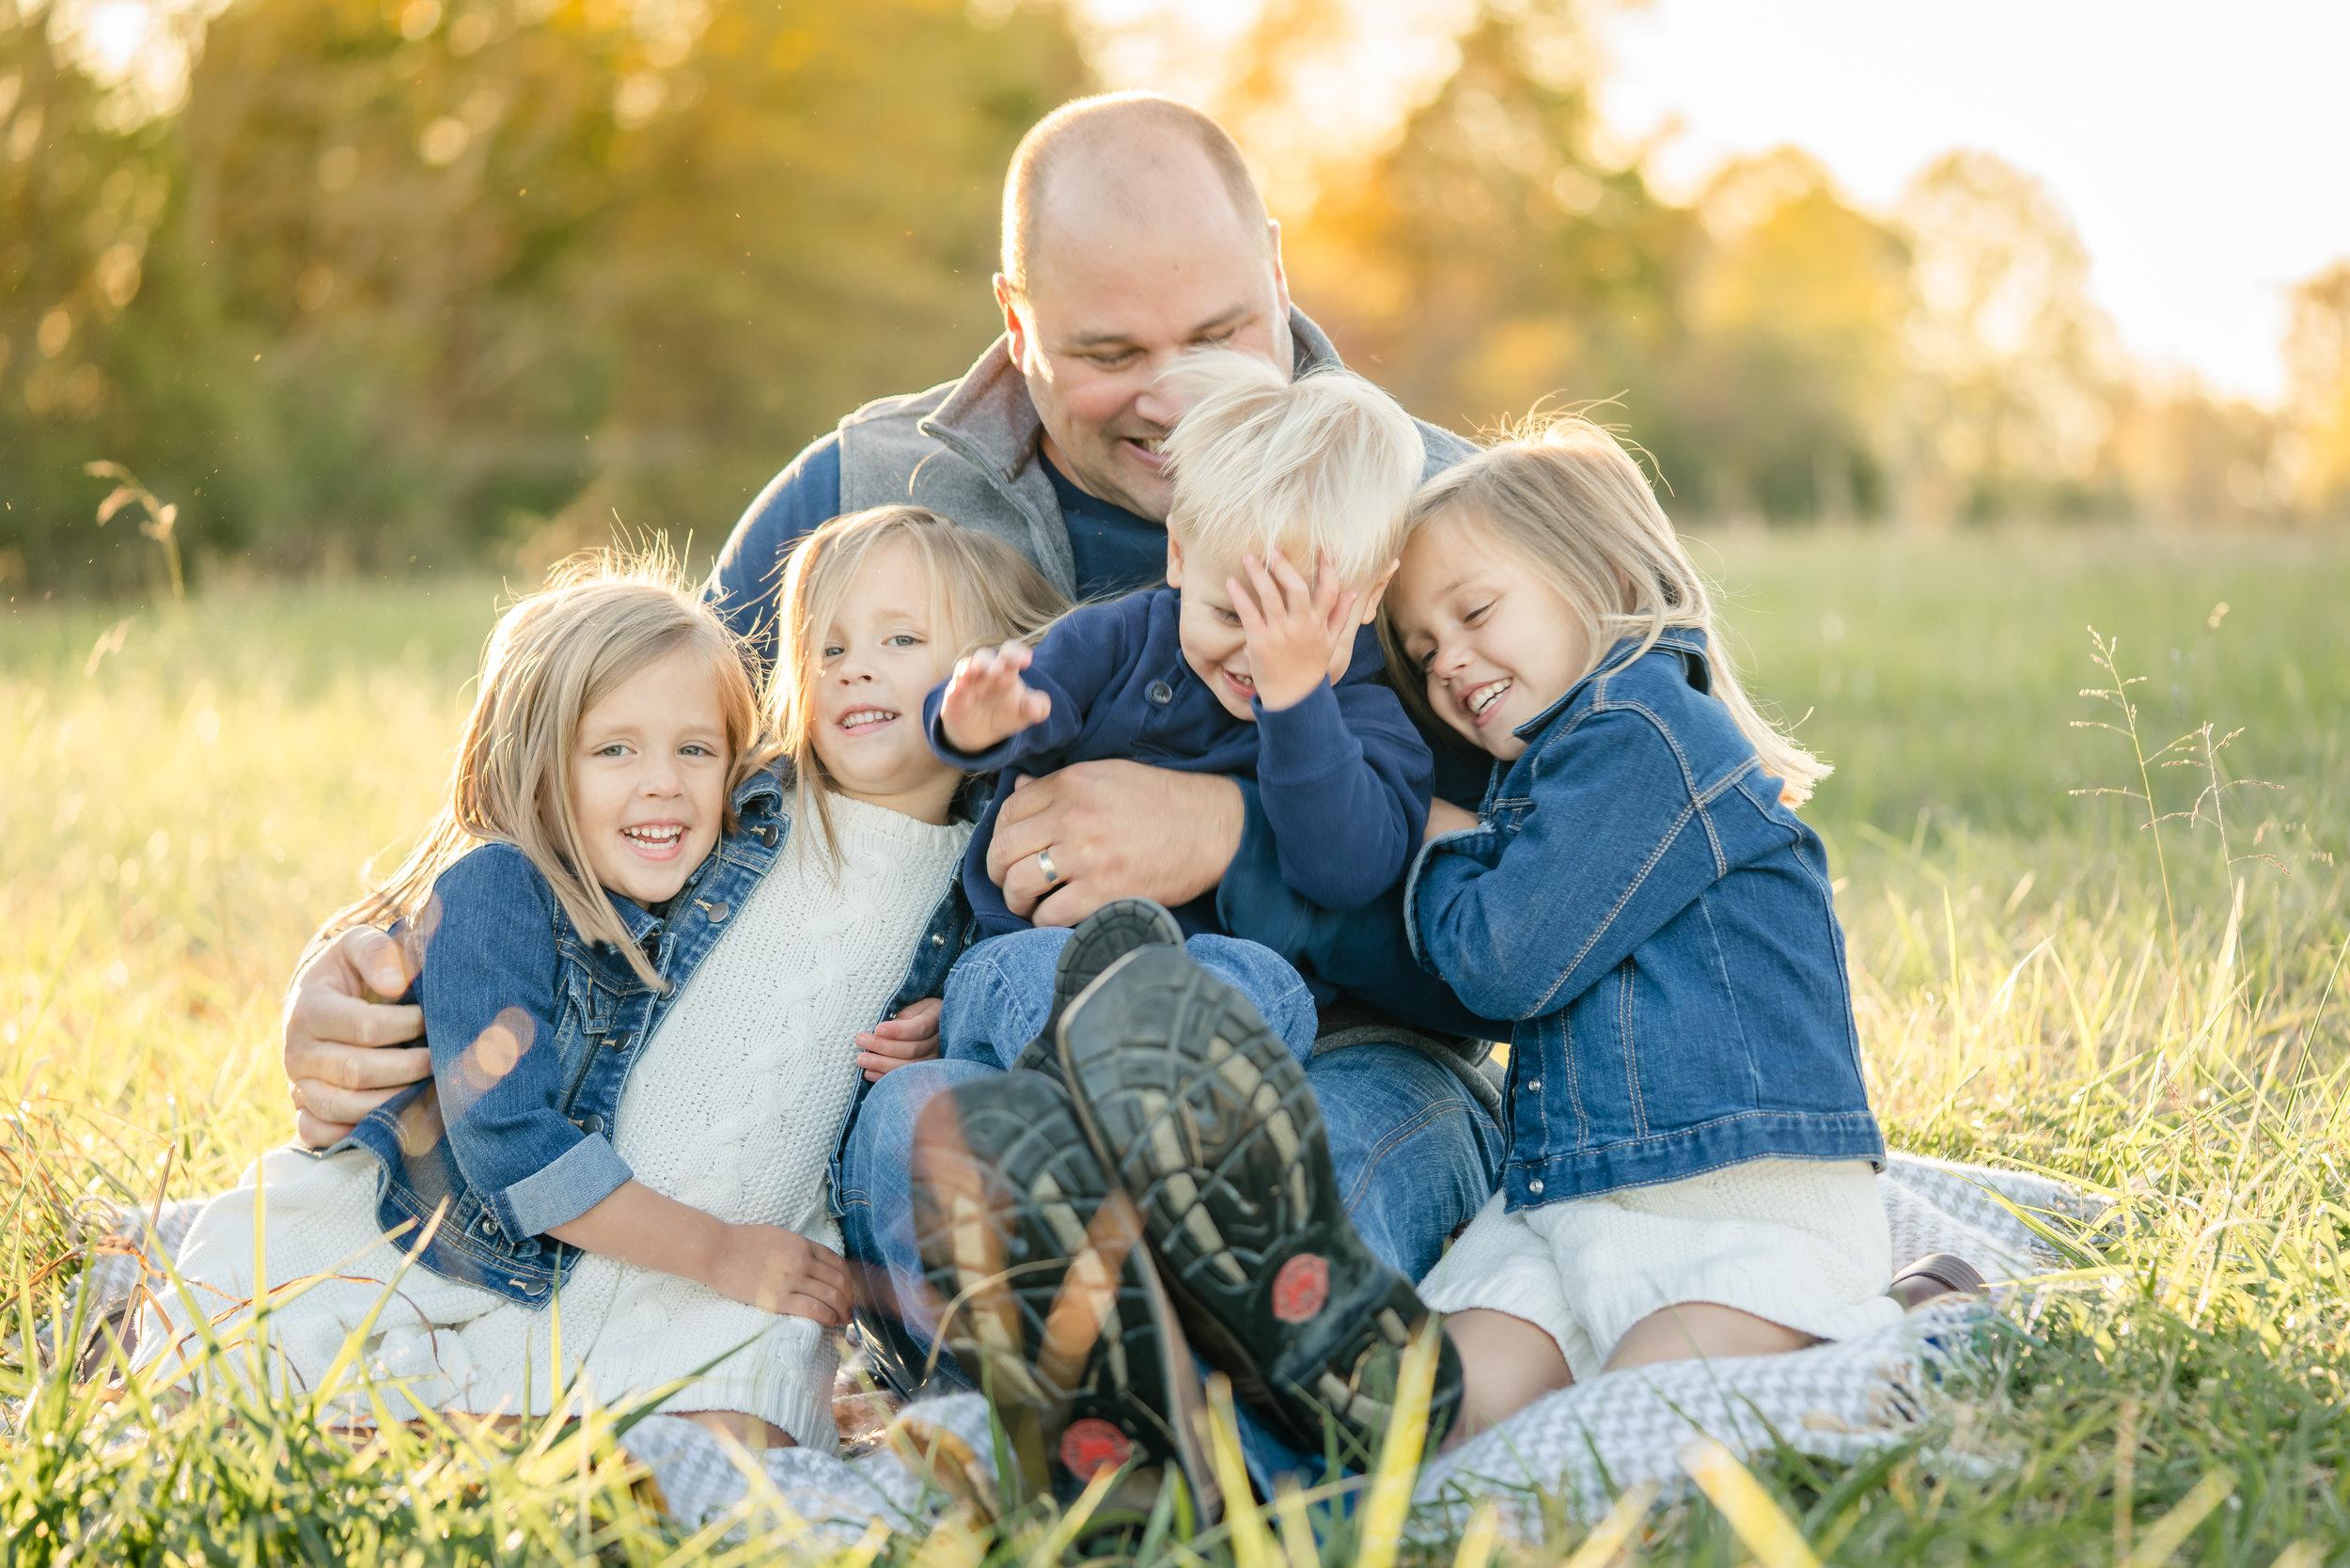 O'Hara Family Portrait Session Nov 2018-3.jpg